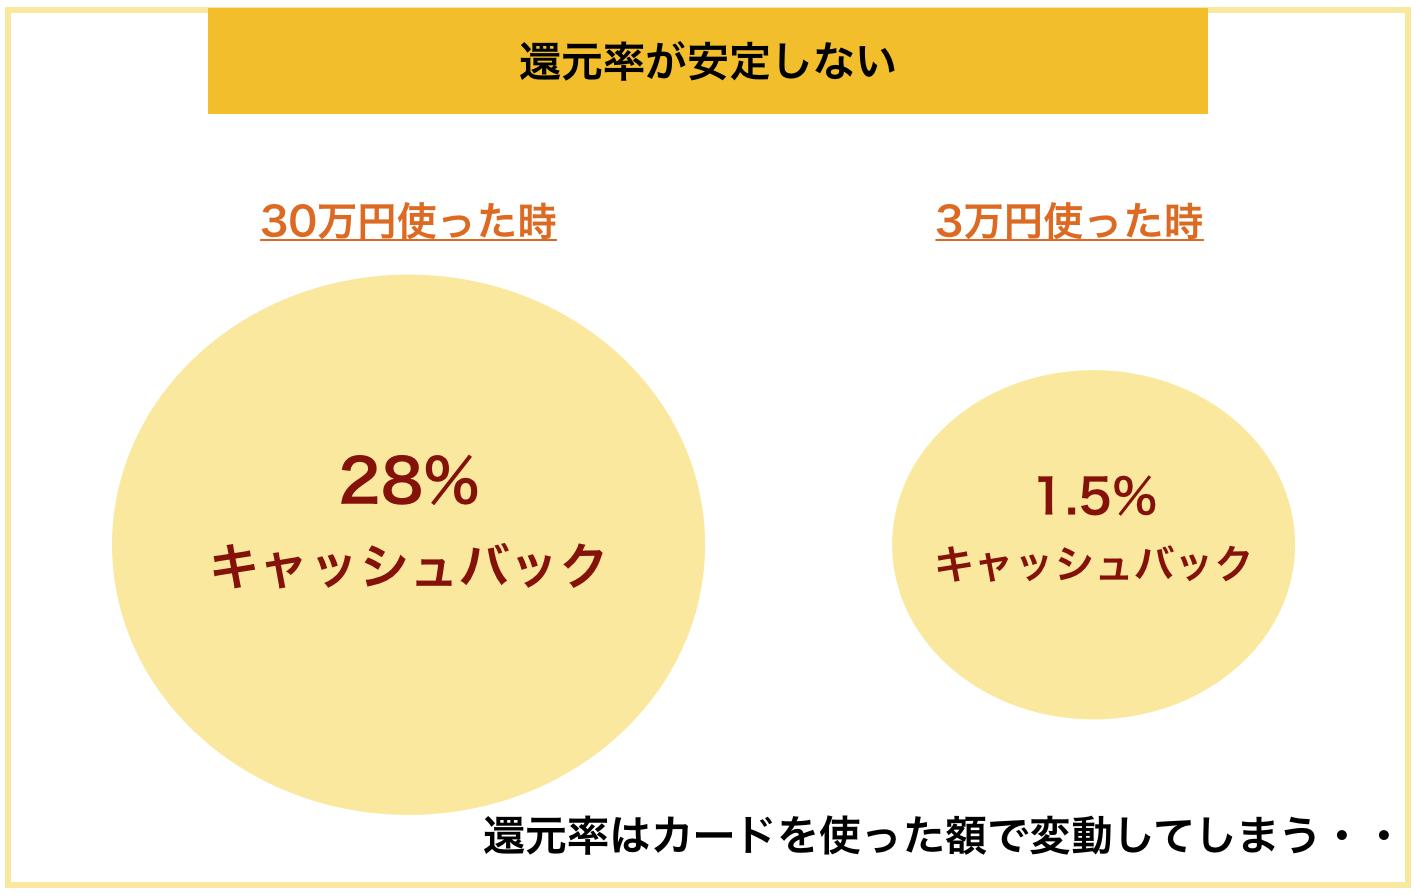 NTTゴールド 還元率不安定